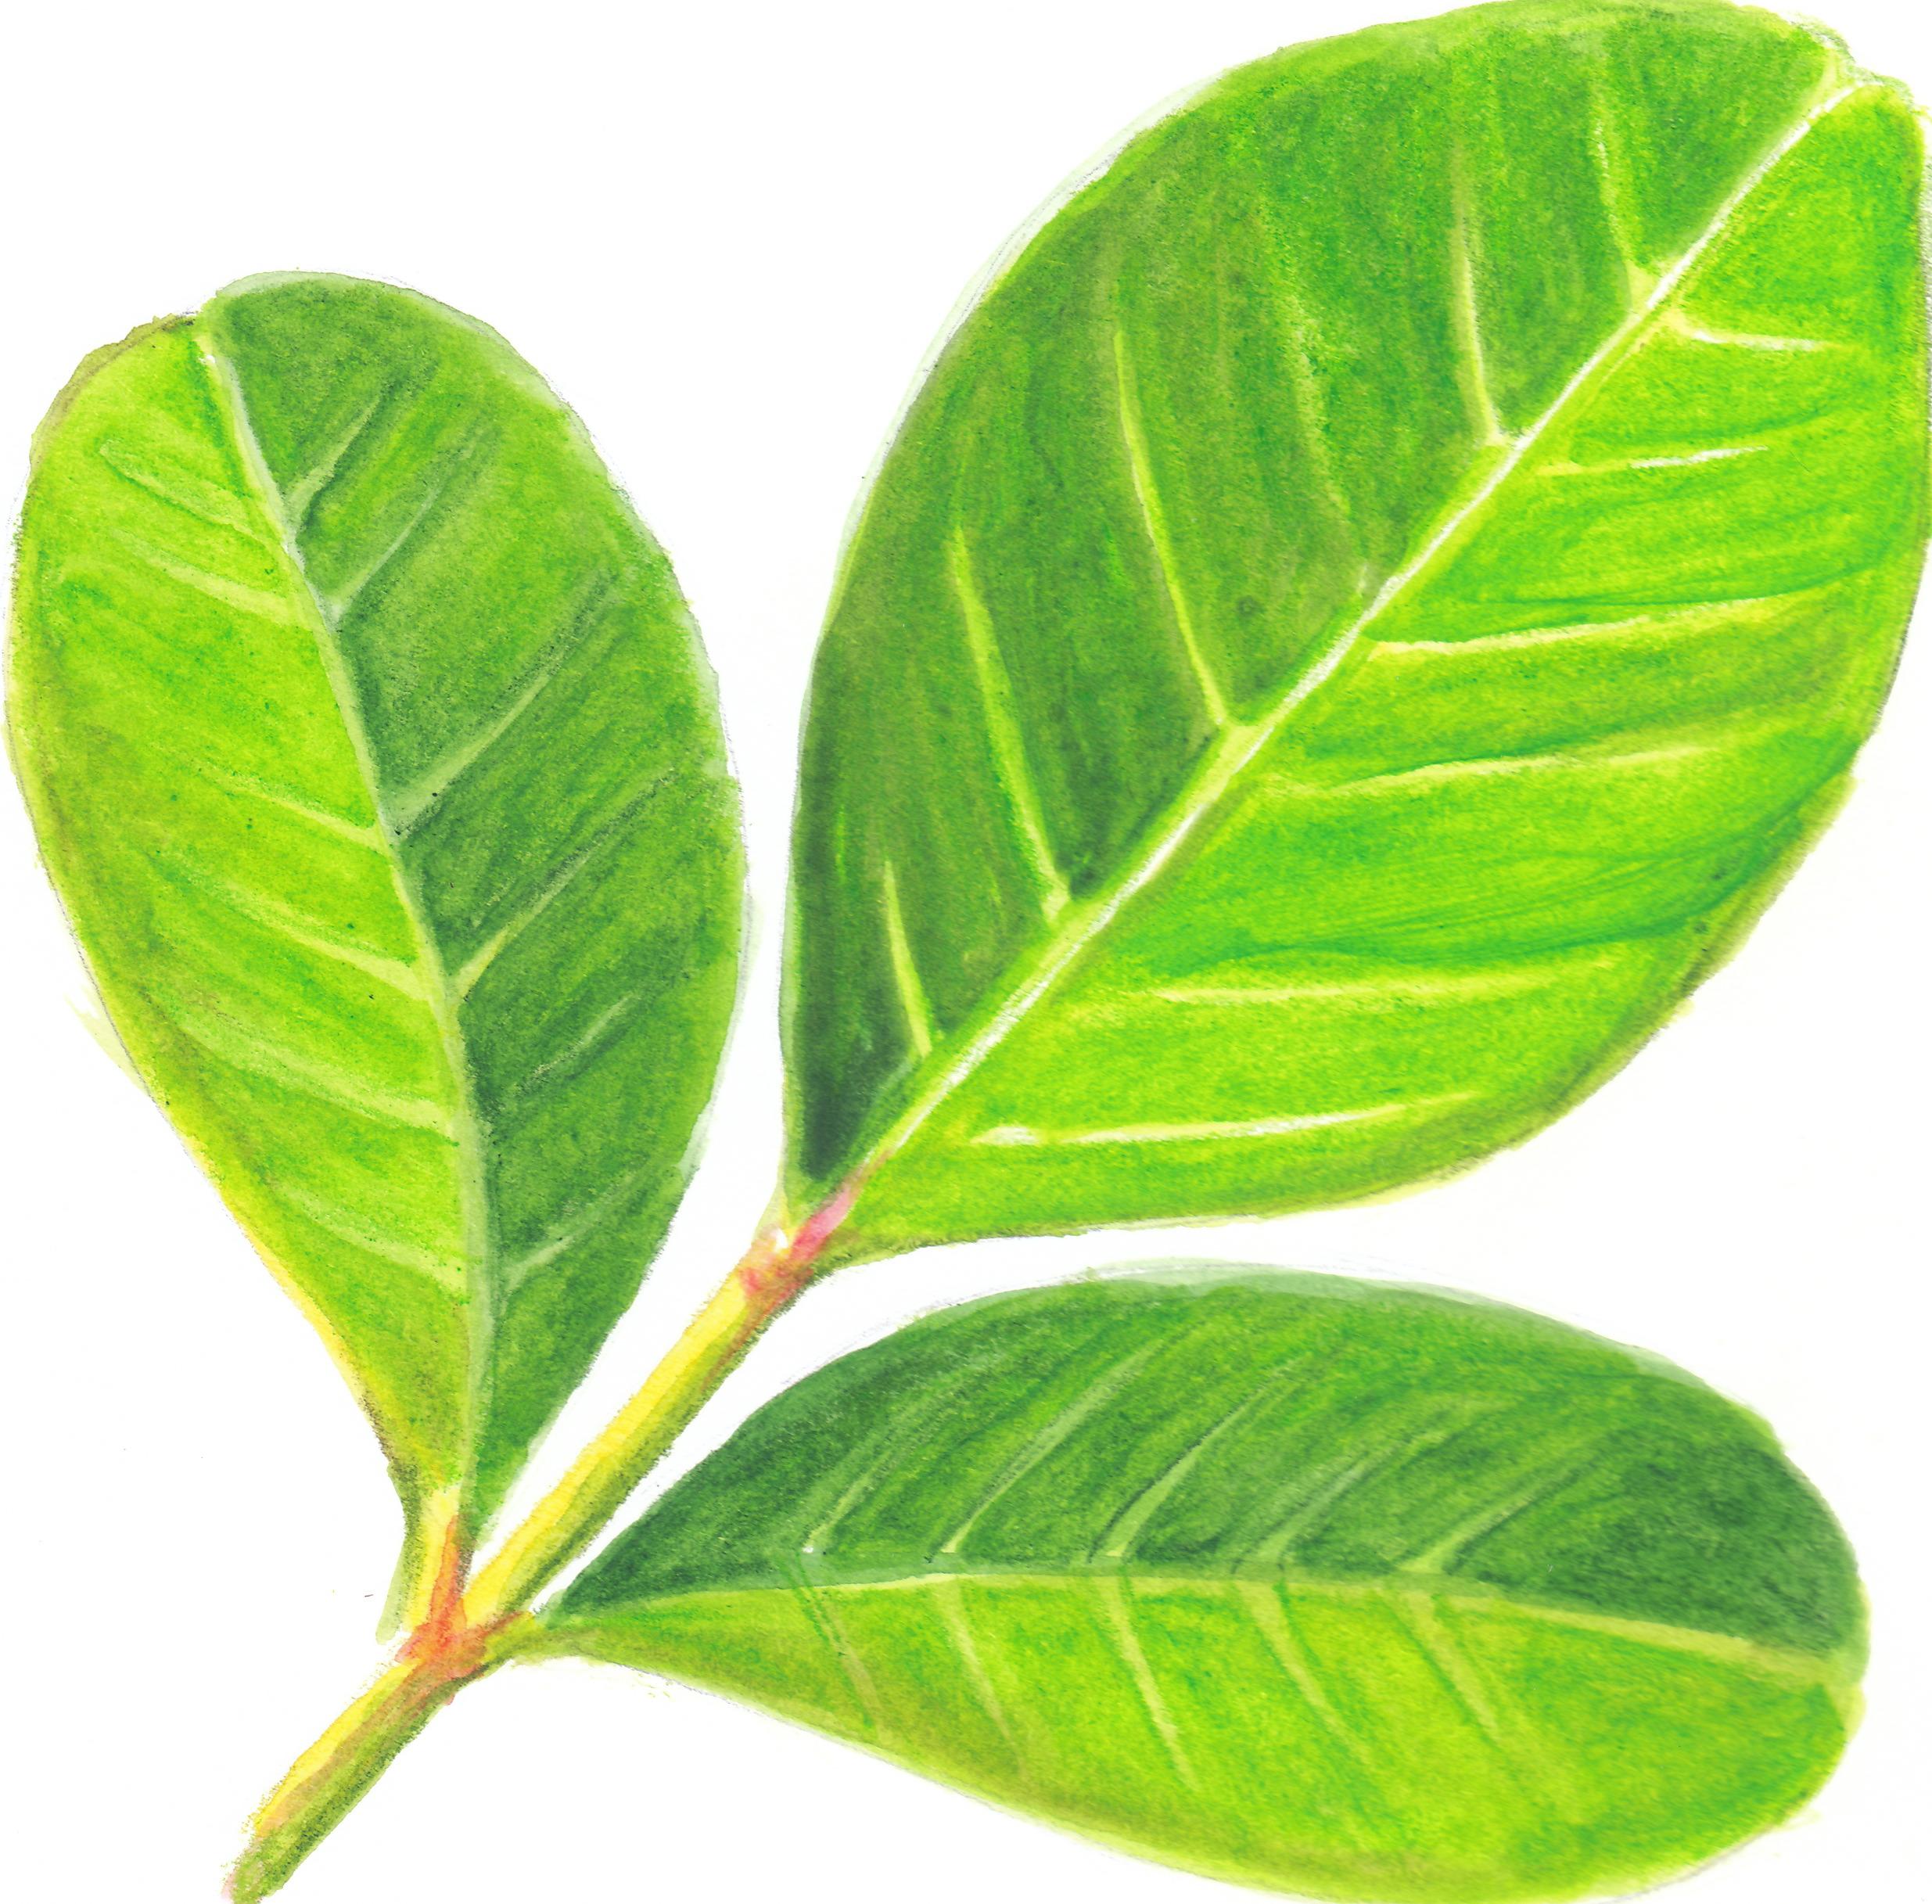 nur-shodjai-art-leaf.jpg